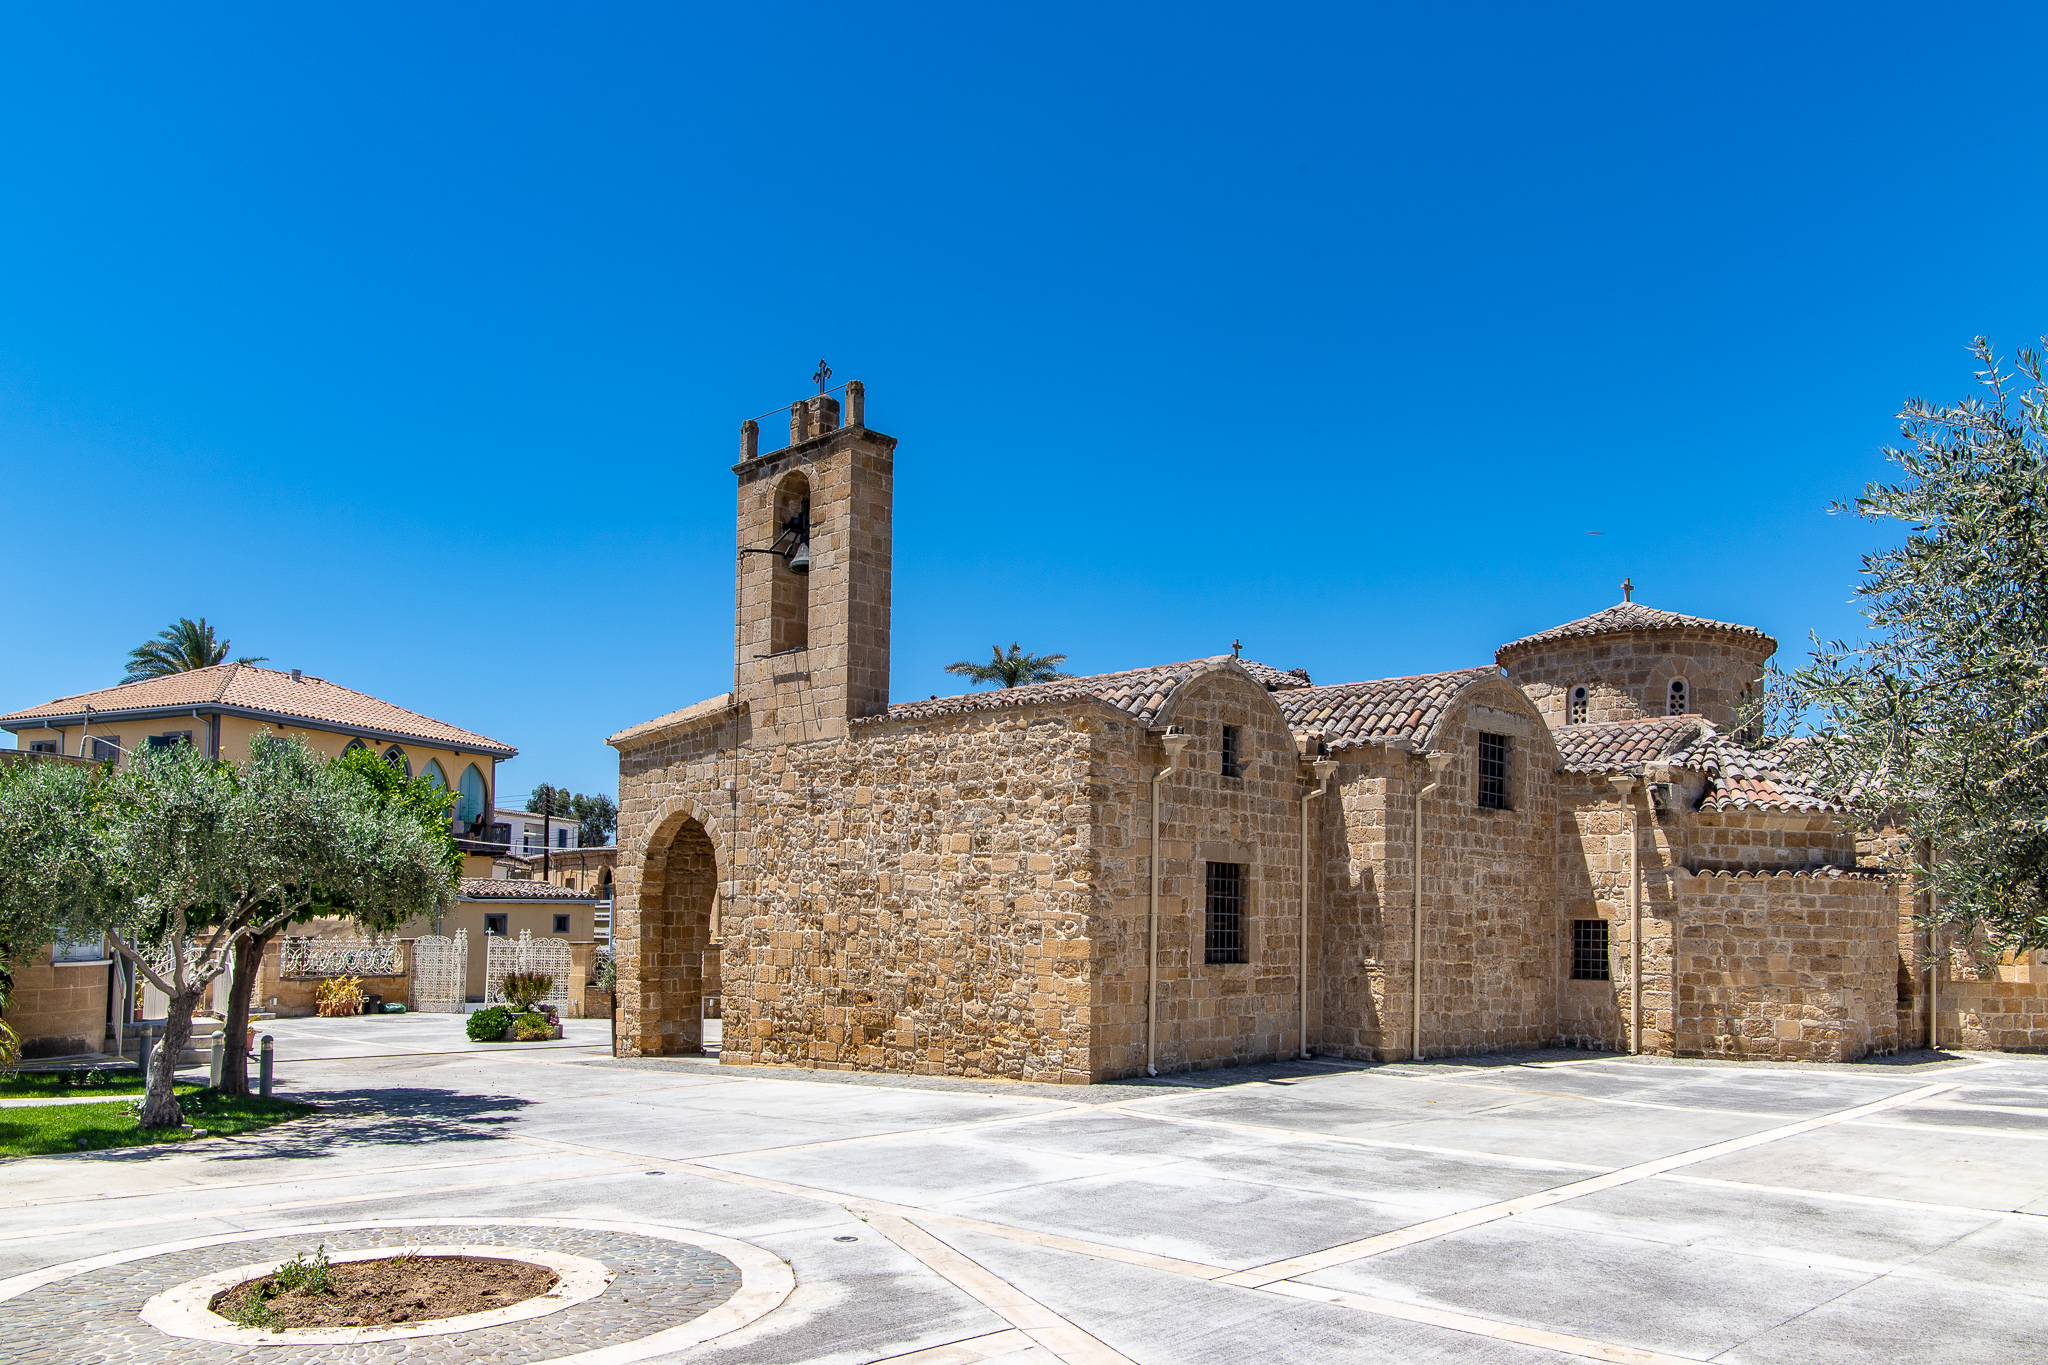 Panagia Chrysaliniotissa Church